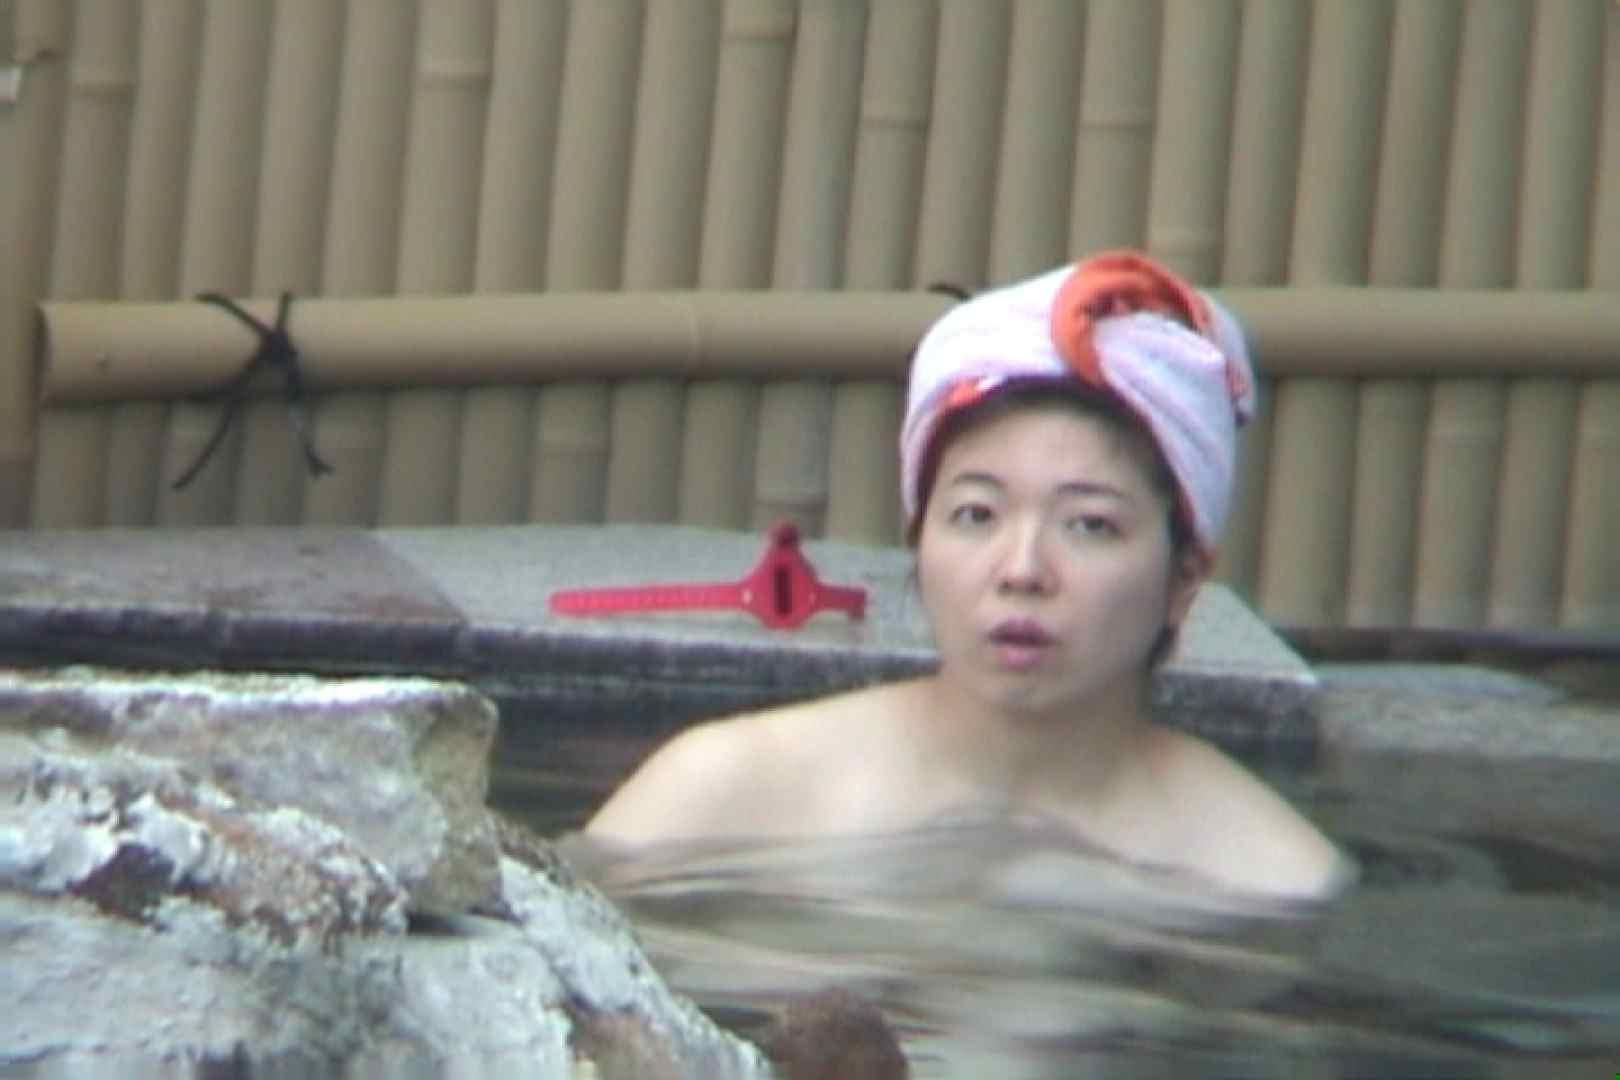 Aquaな露天風呂Vol.573 0 | 0  85連発 1